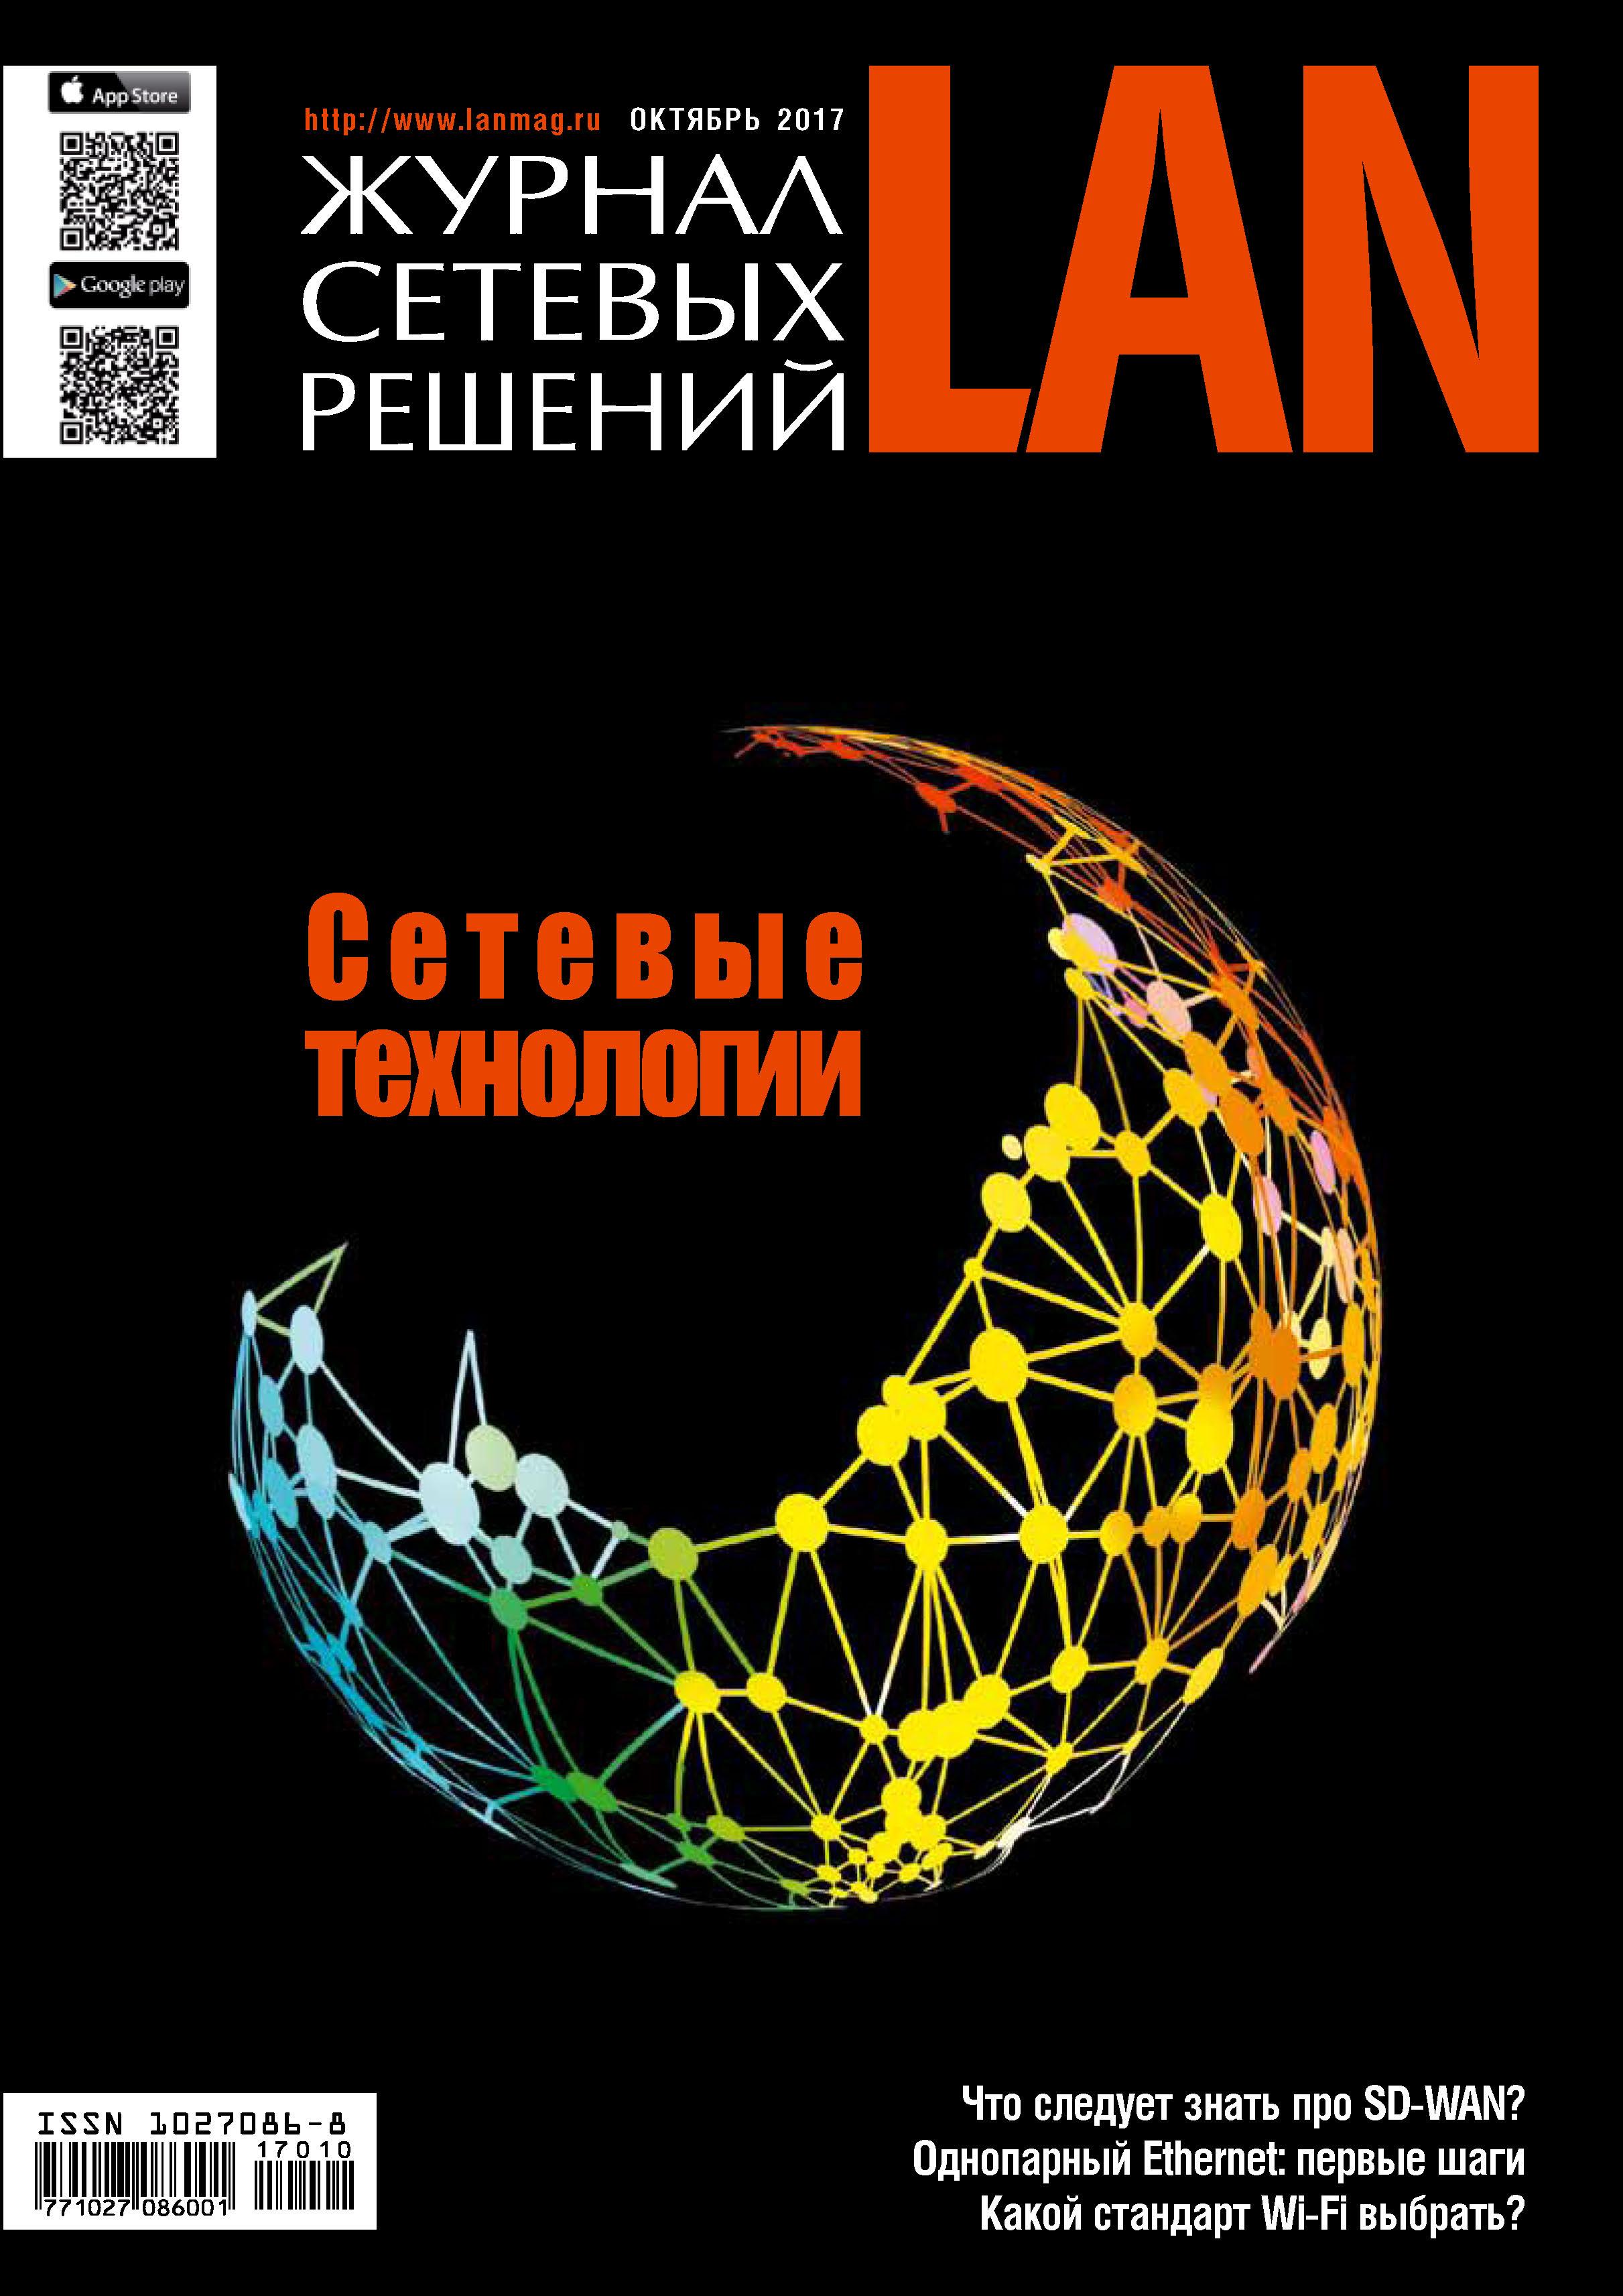 Журнал сетевых решений / LAN №10/2017